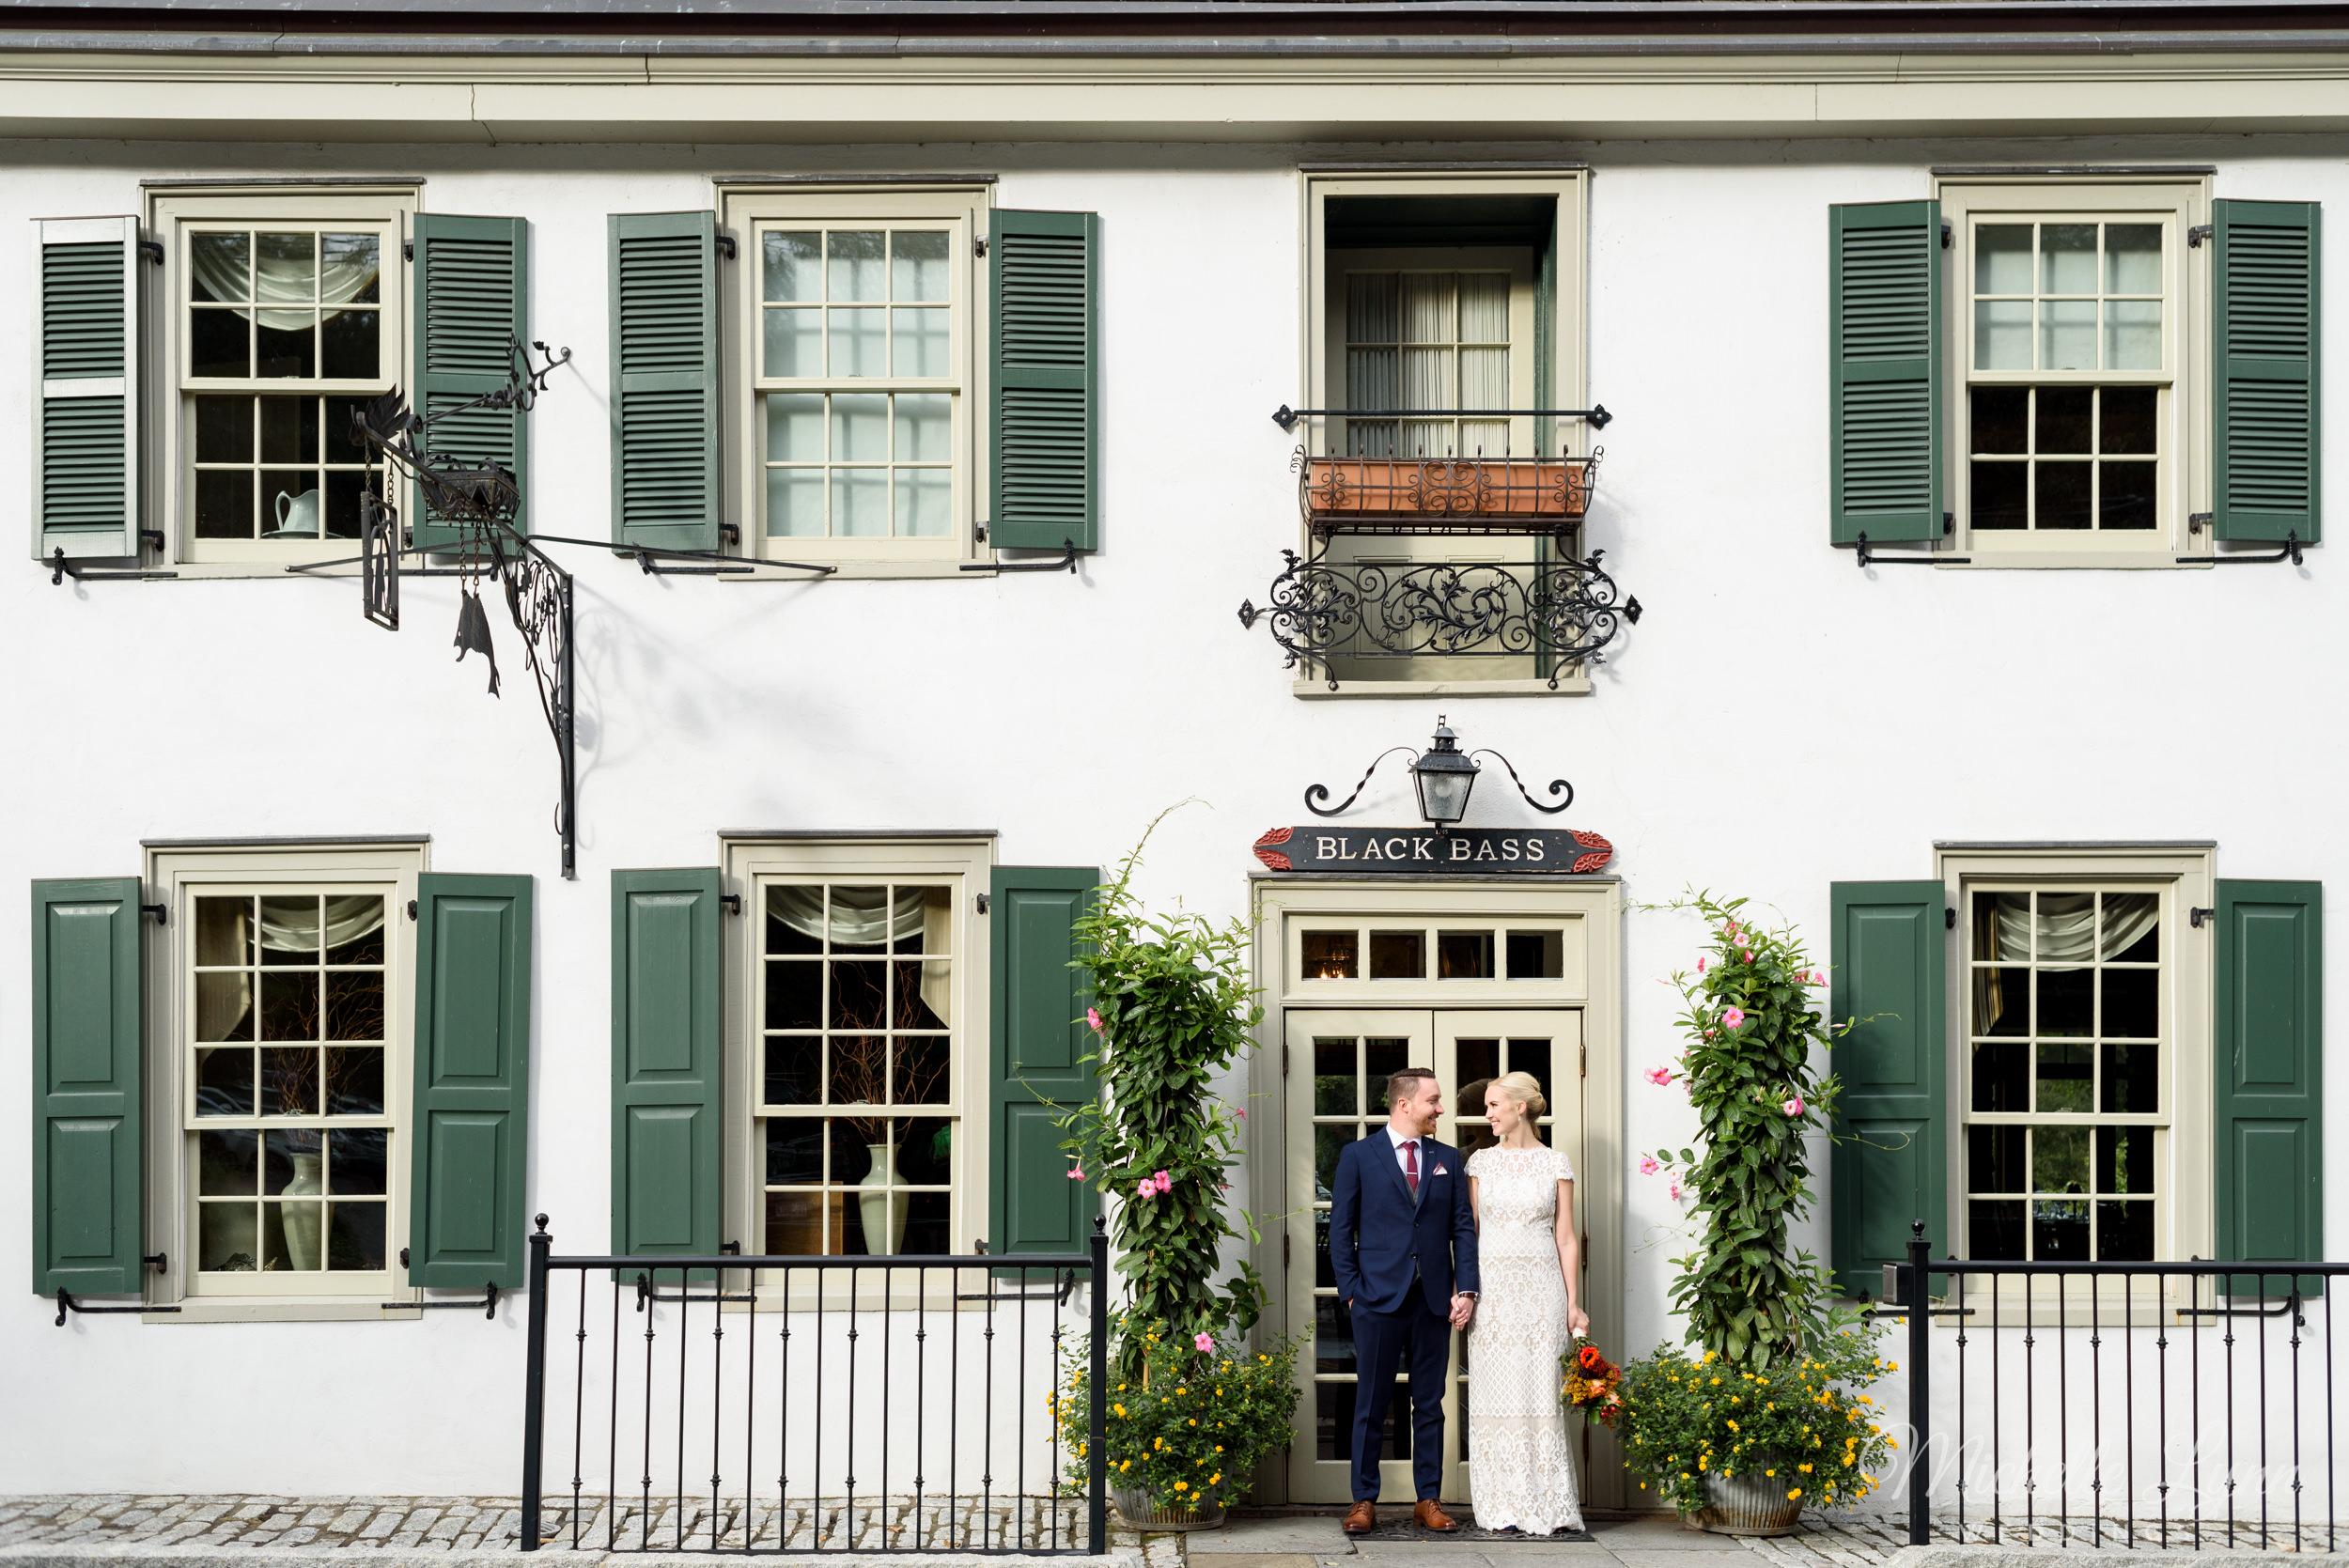 mlw-lumberville-general-store-new-hope-wedding-photographer-1.jpg